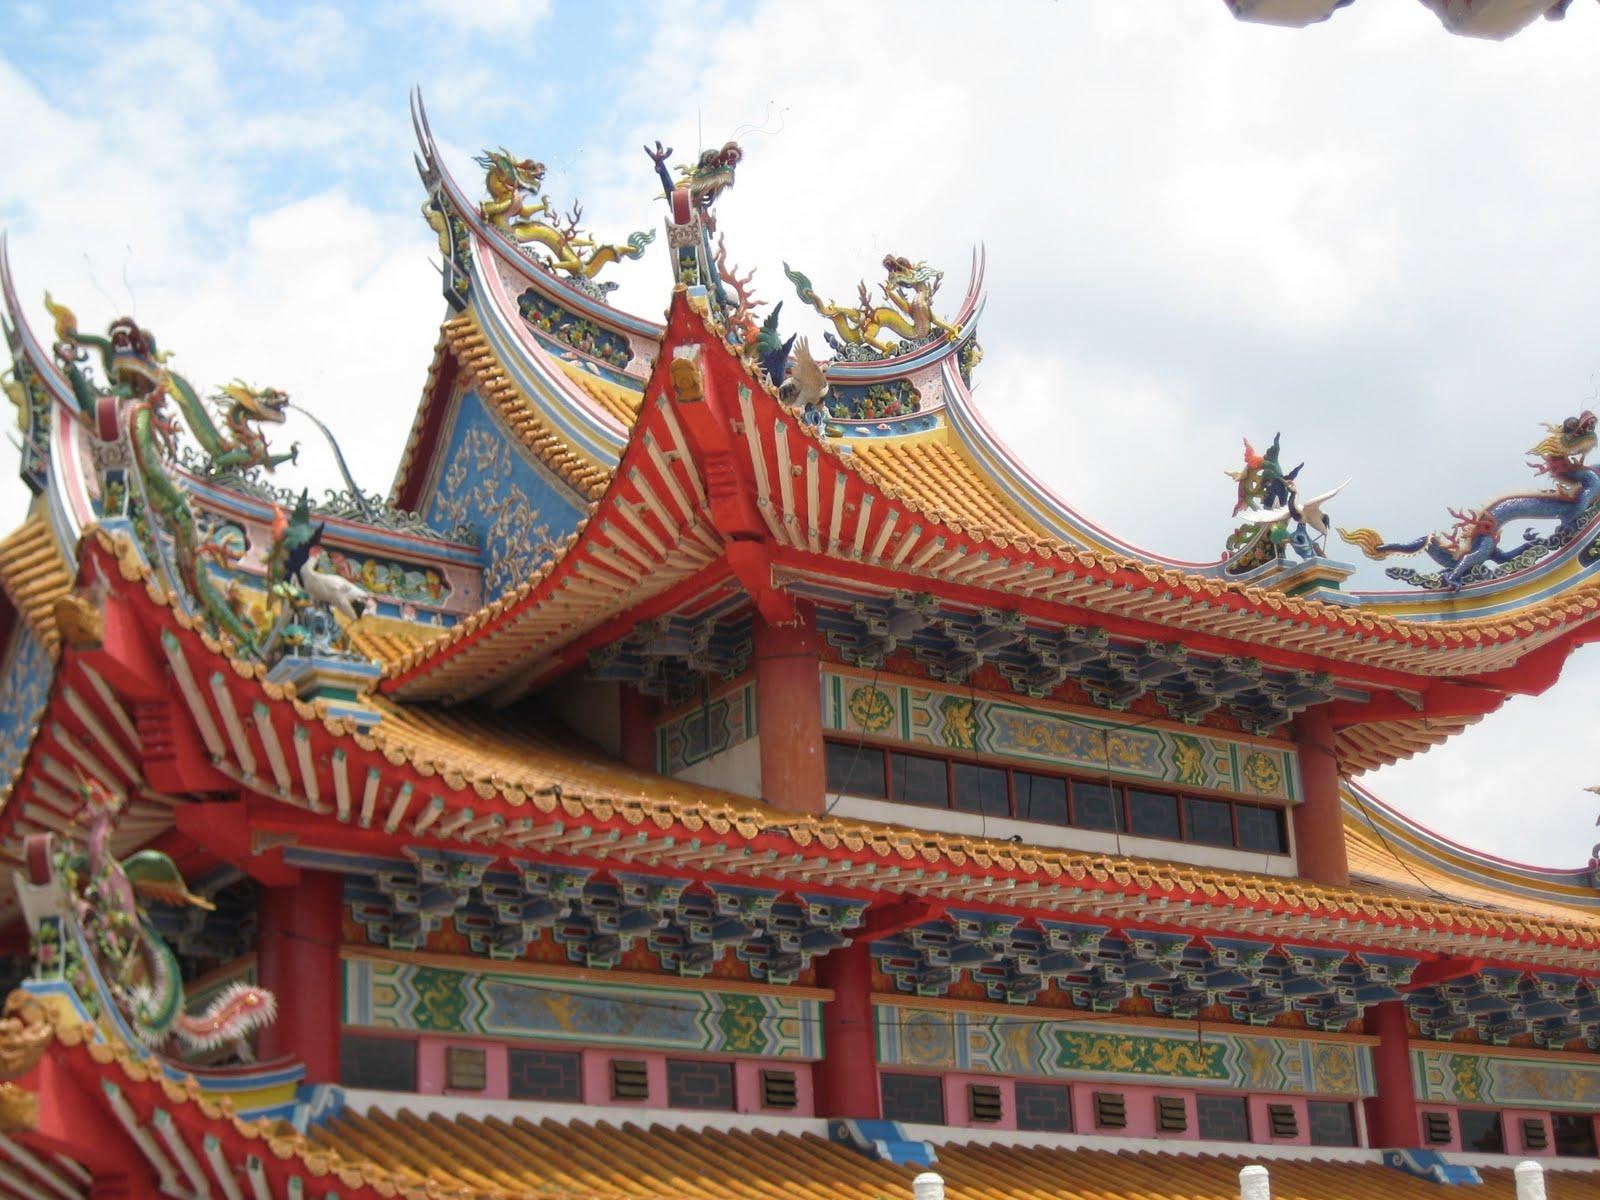 Ken Amp Patti S Hong Kong Adventure Chinese Temple